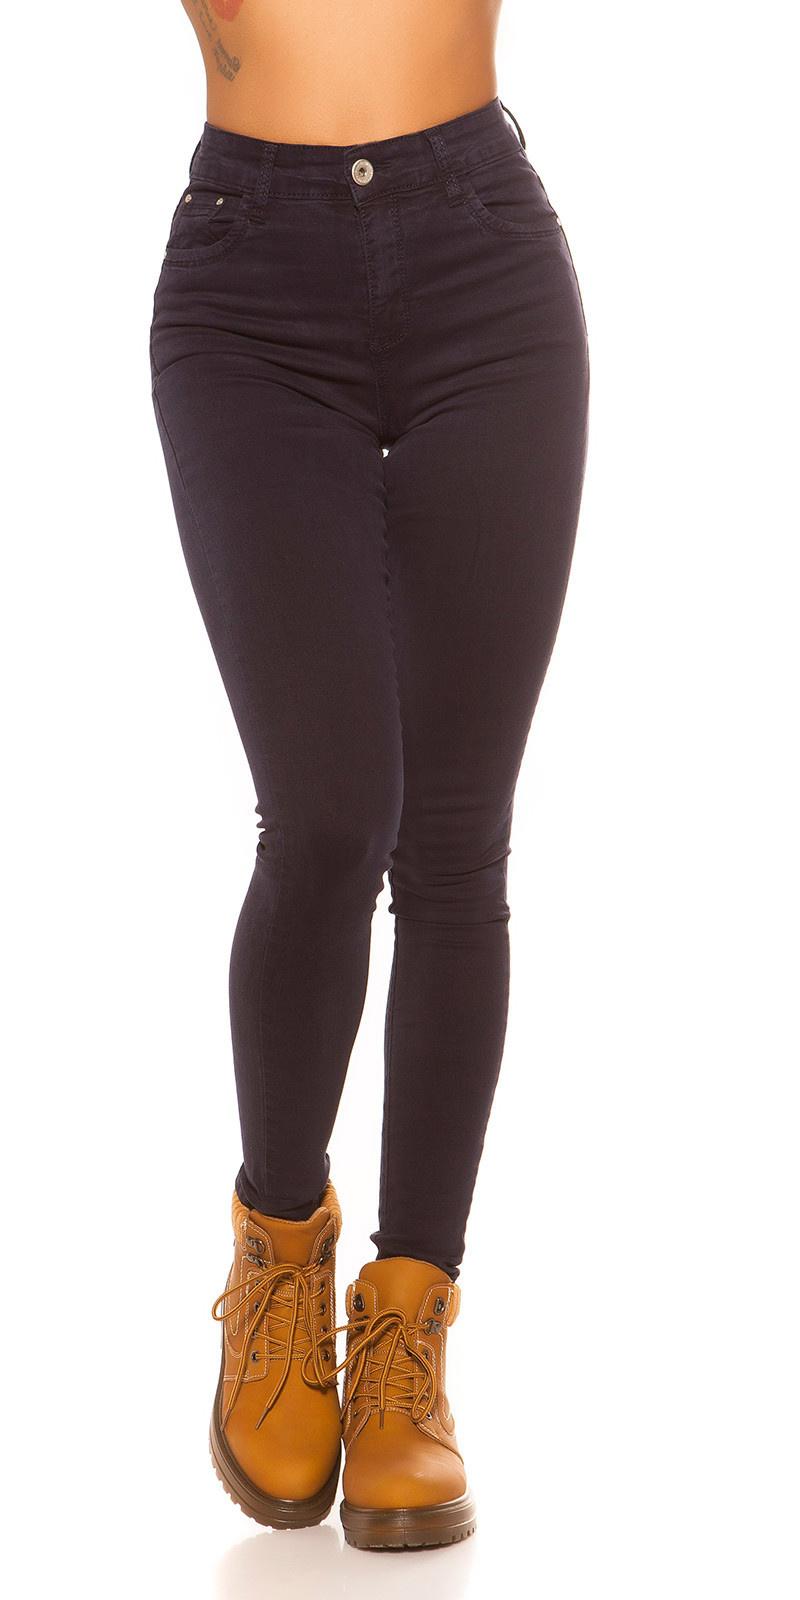 Sexy skinny hoge taille 5 zaks jeans donkerblauw